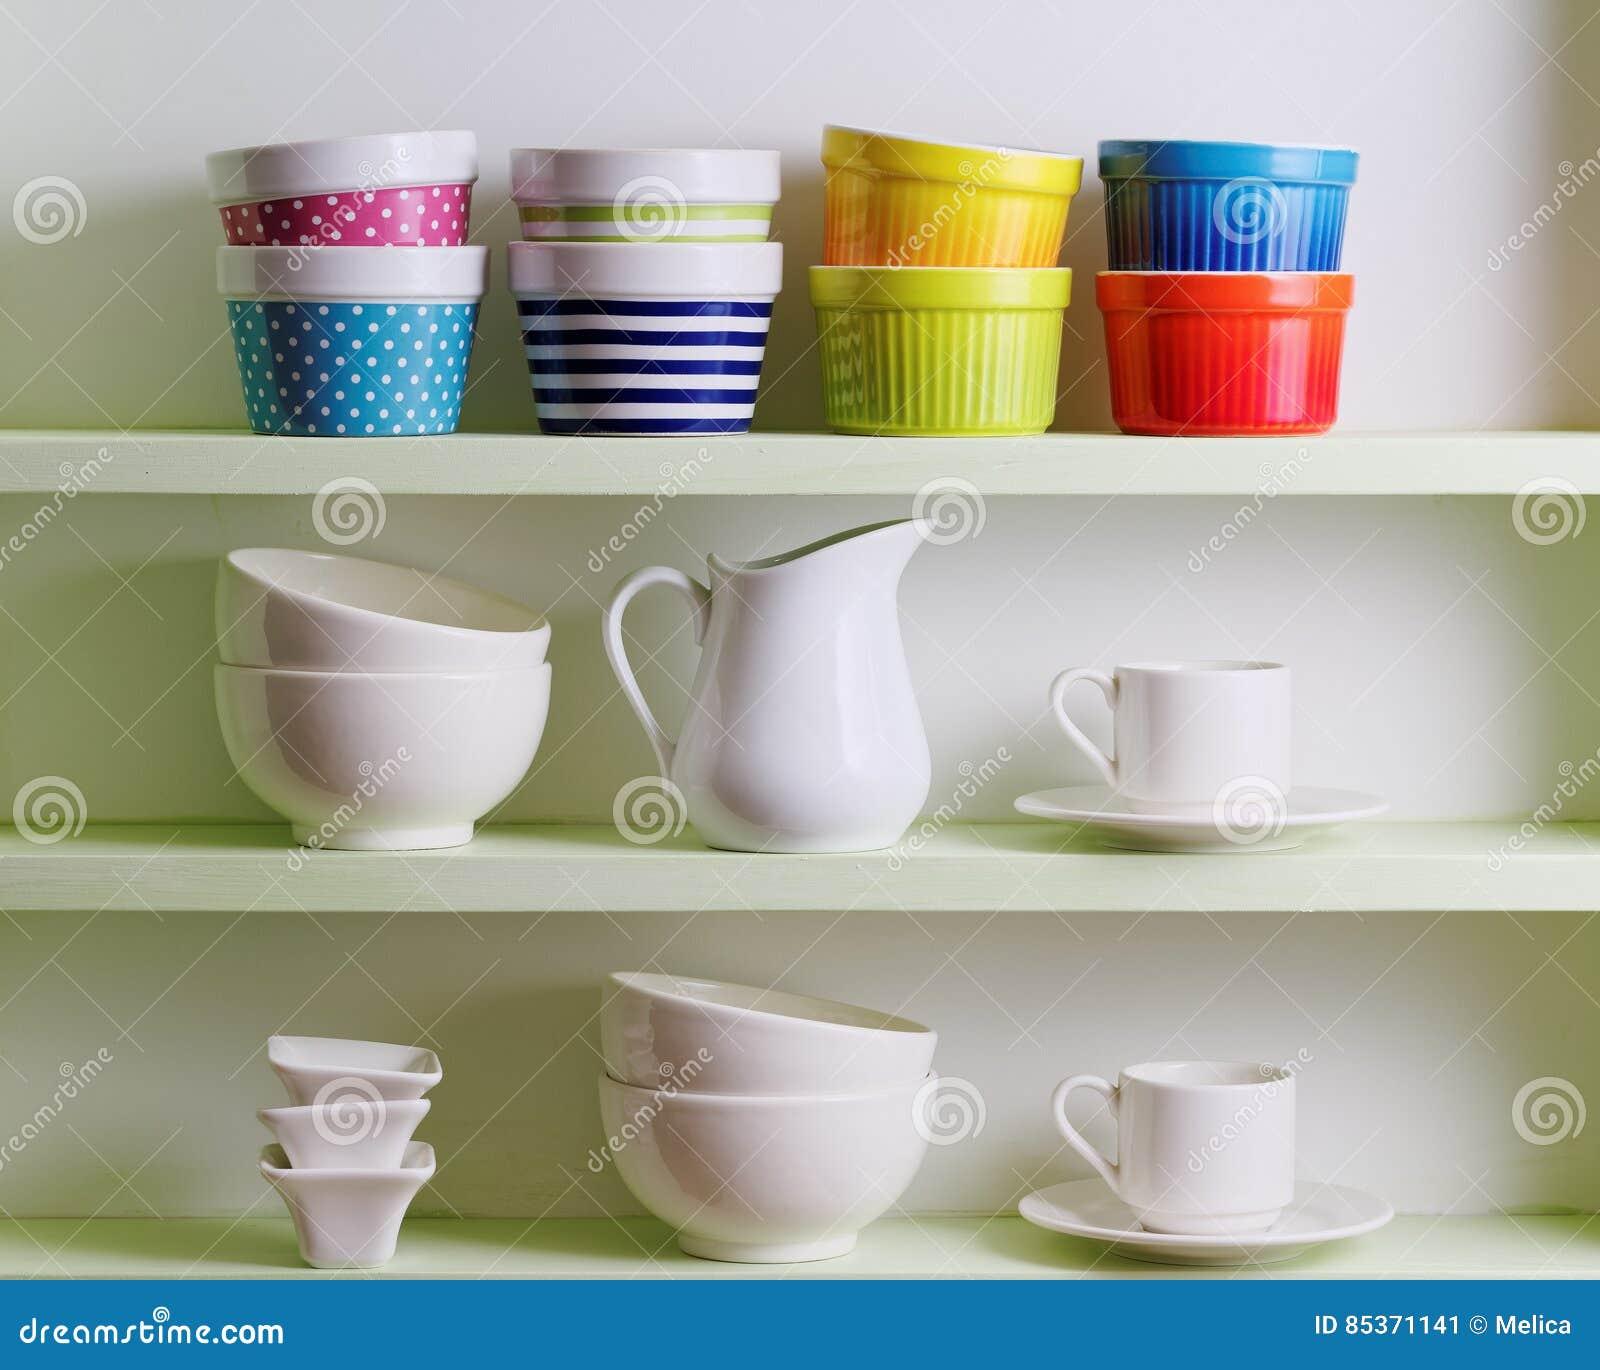 Kitchen Shelf Arrangement: Kitchen Shelf Arrangement. Stock Image. Image Of Coffee